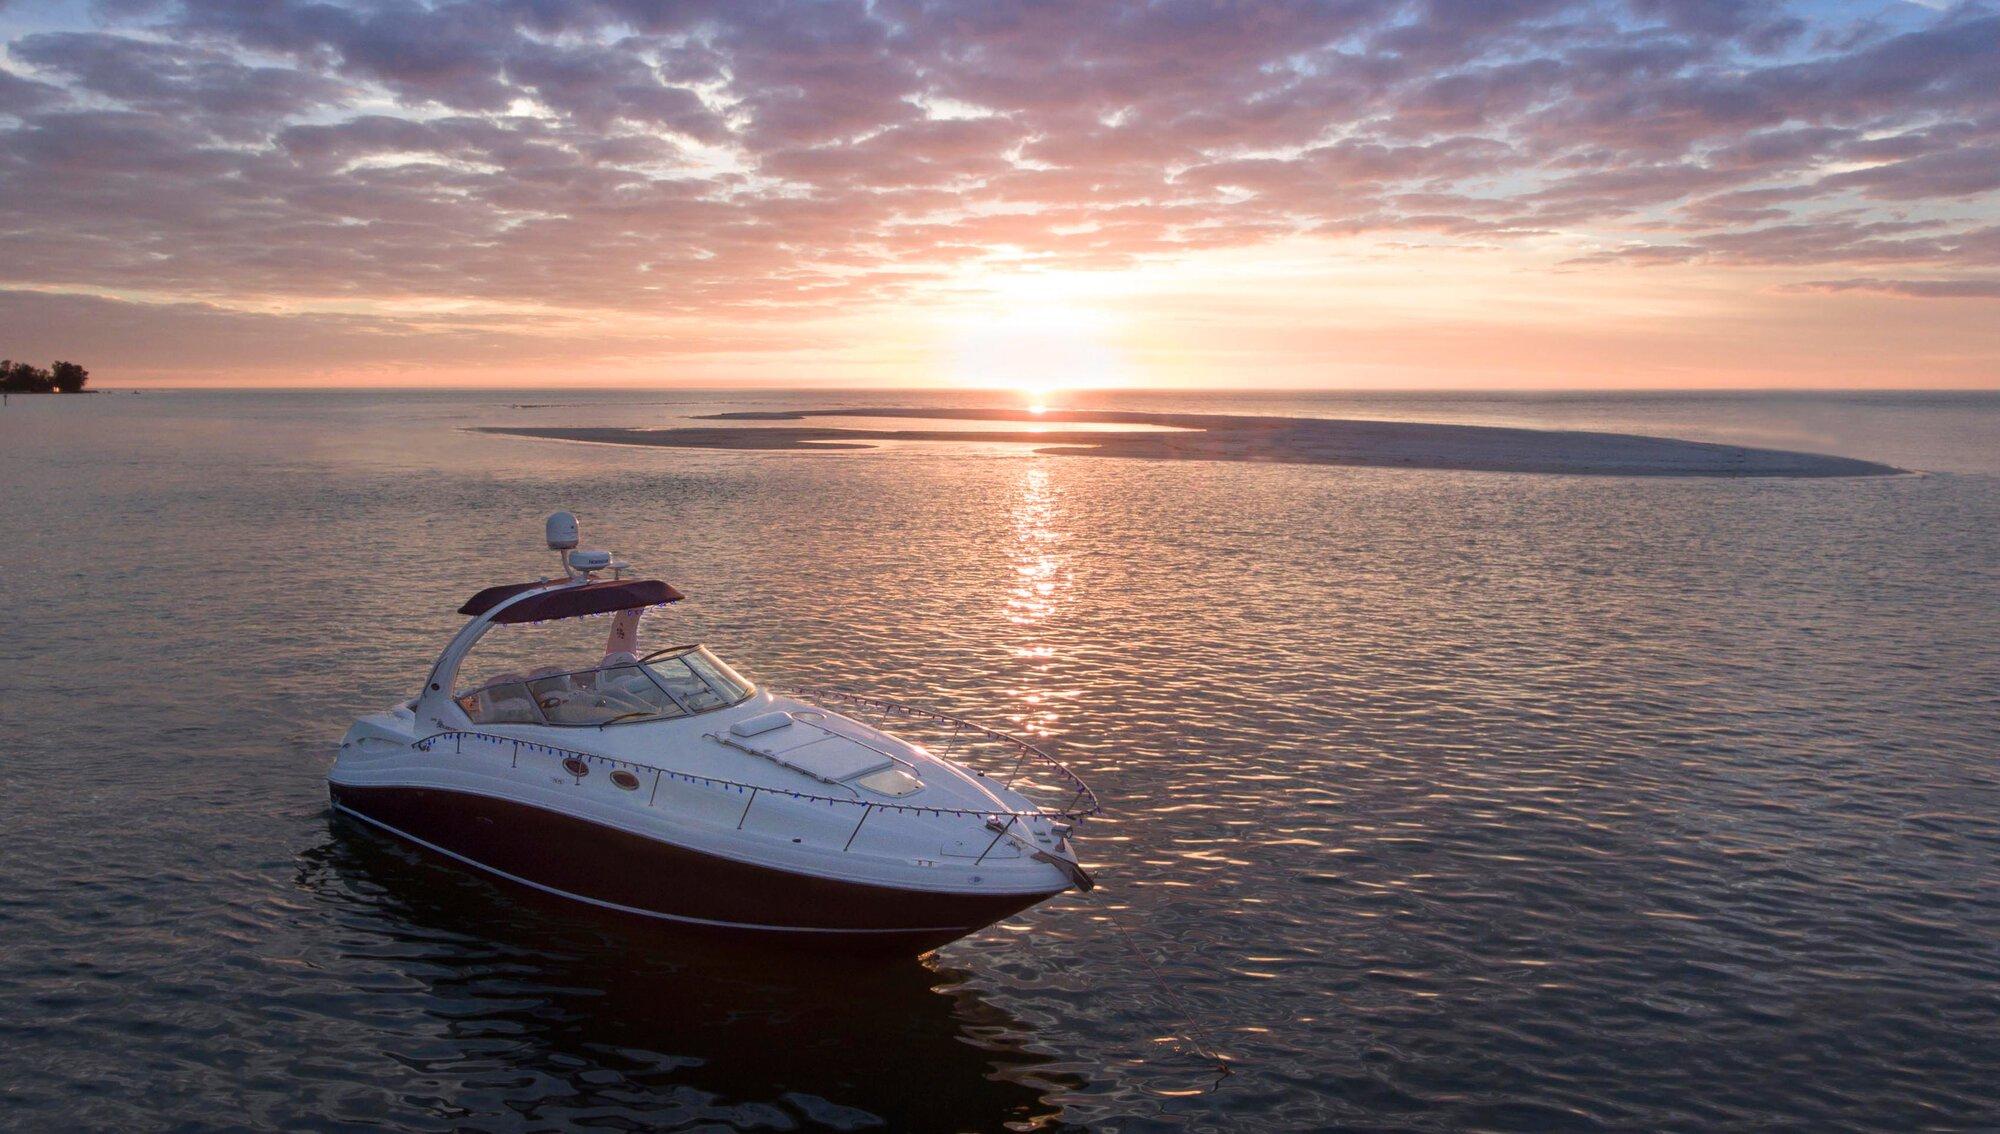 Luxury-boat-anchored-by-sandbar-sunset_SarasotaFlorida_1_2000x1134_etovilla